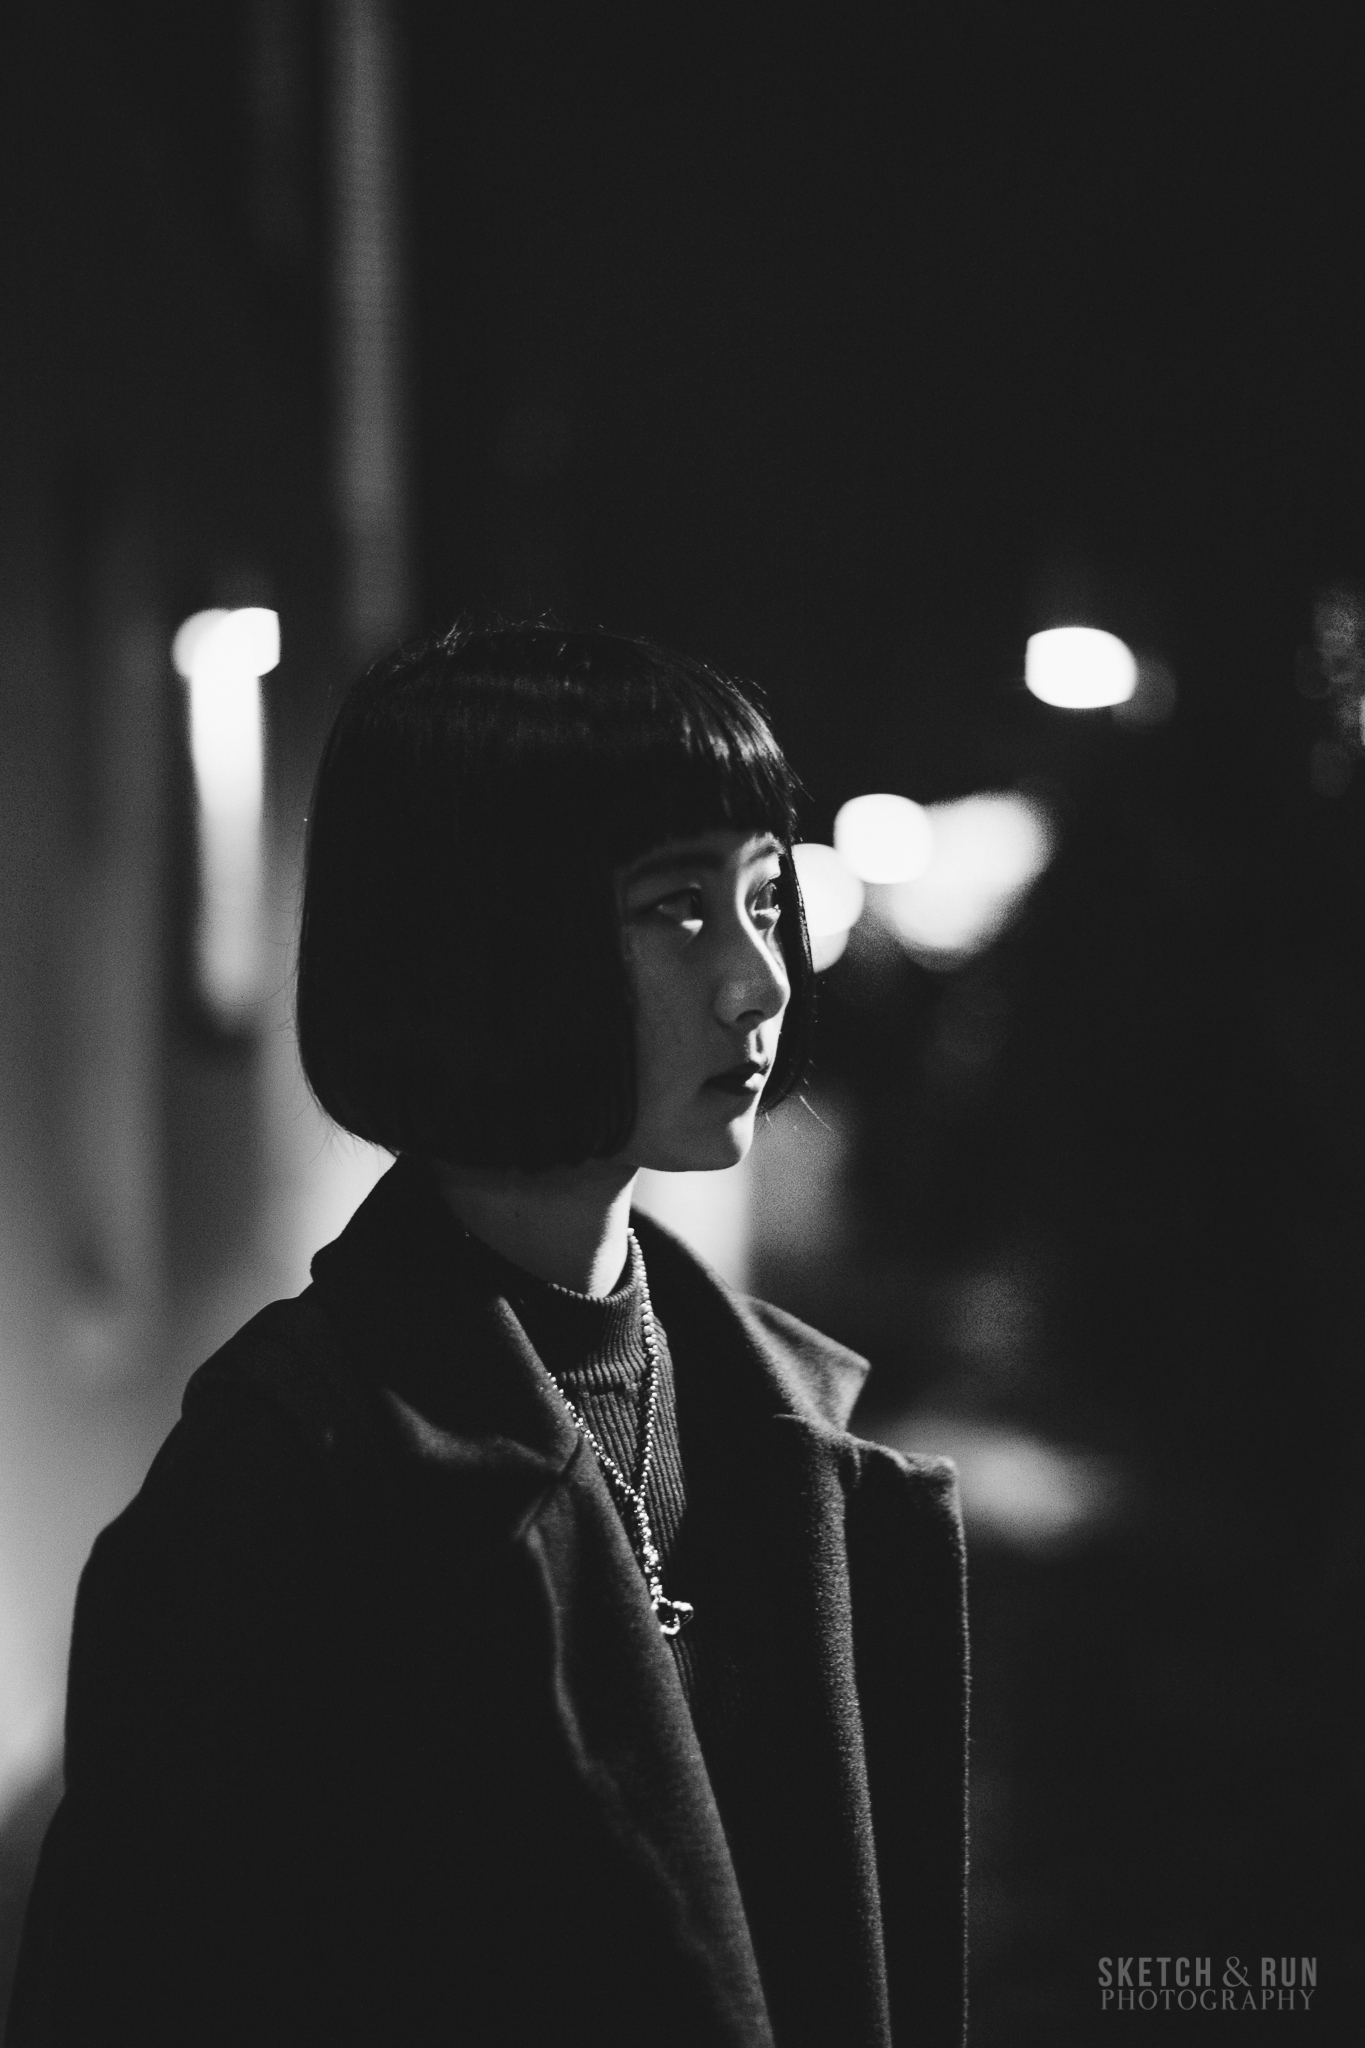 vivid sydney, portrait, tokumaki, portrait photography